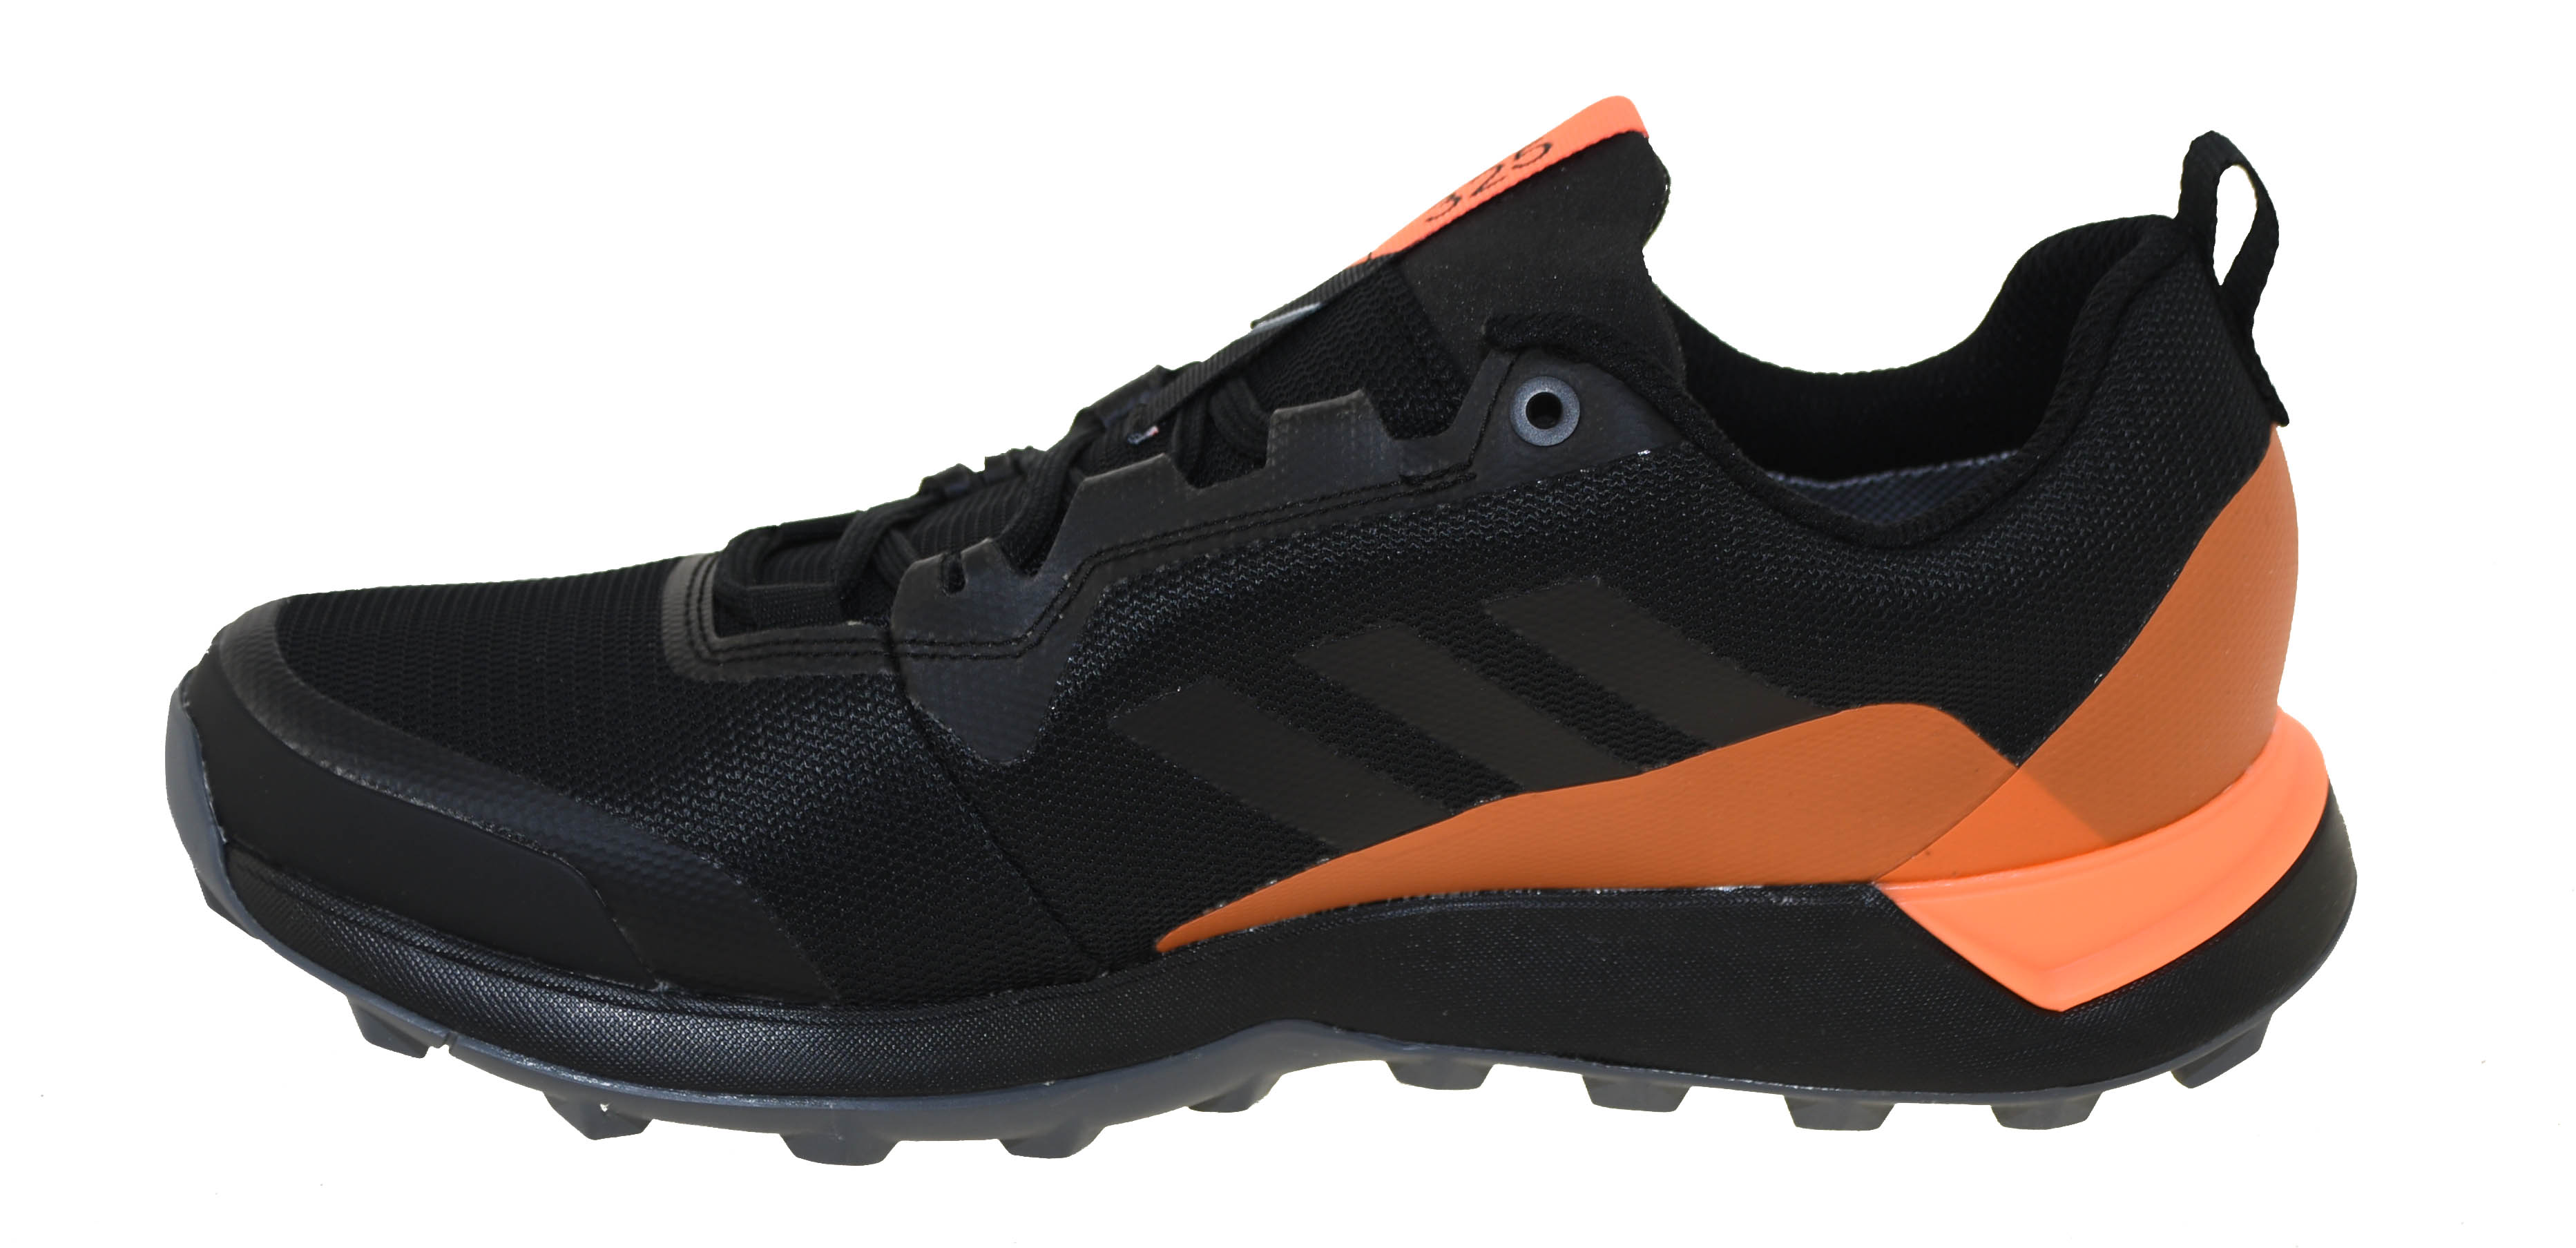 the latest 8e387 8620d Adidas Men s Terrex CMTK GTX Trail Running Shoe Black Grey Orange Style  AC7922